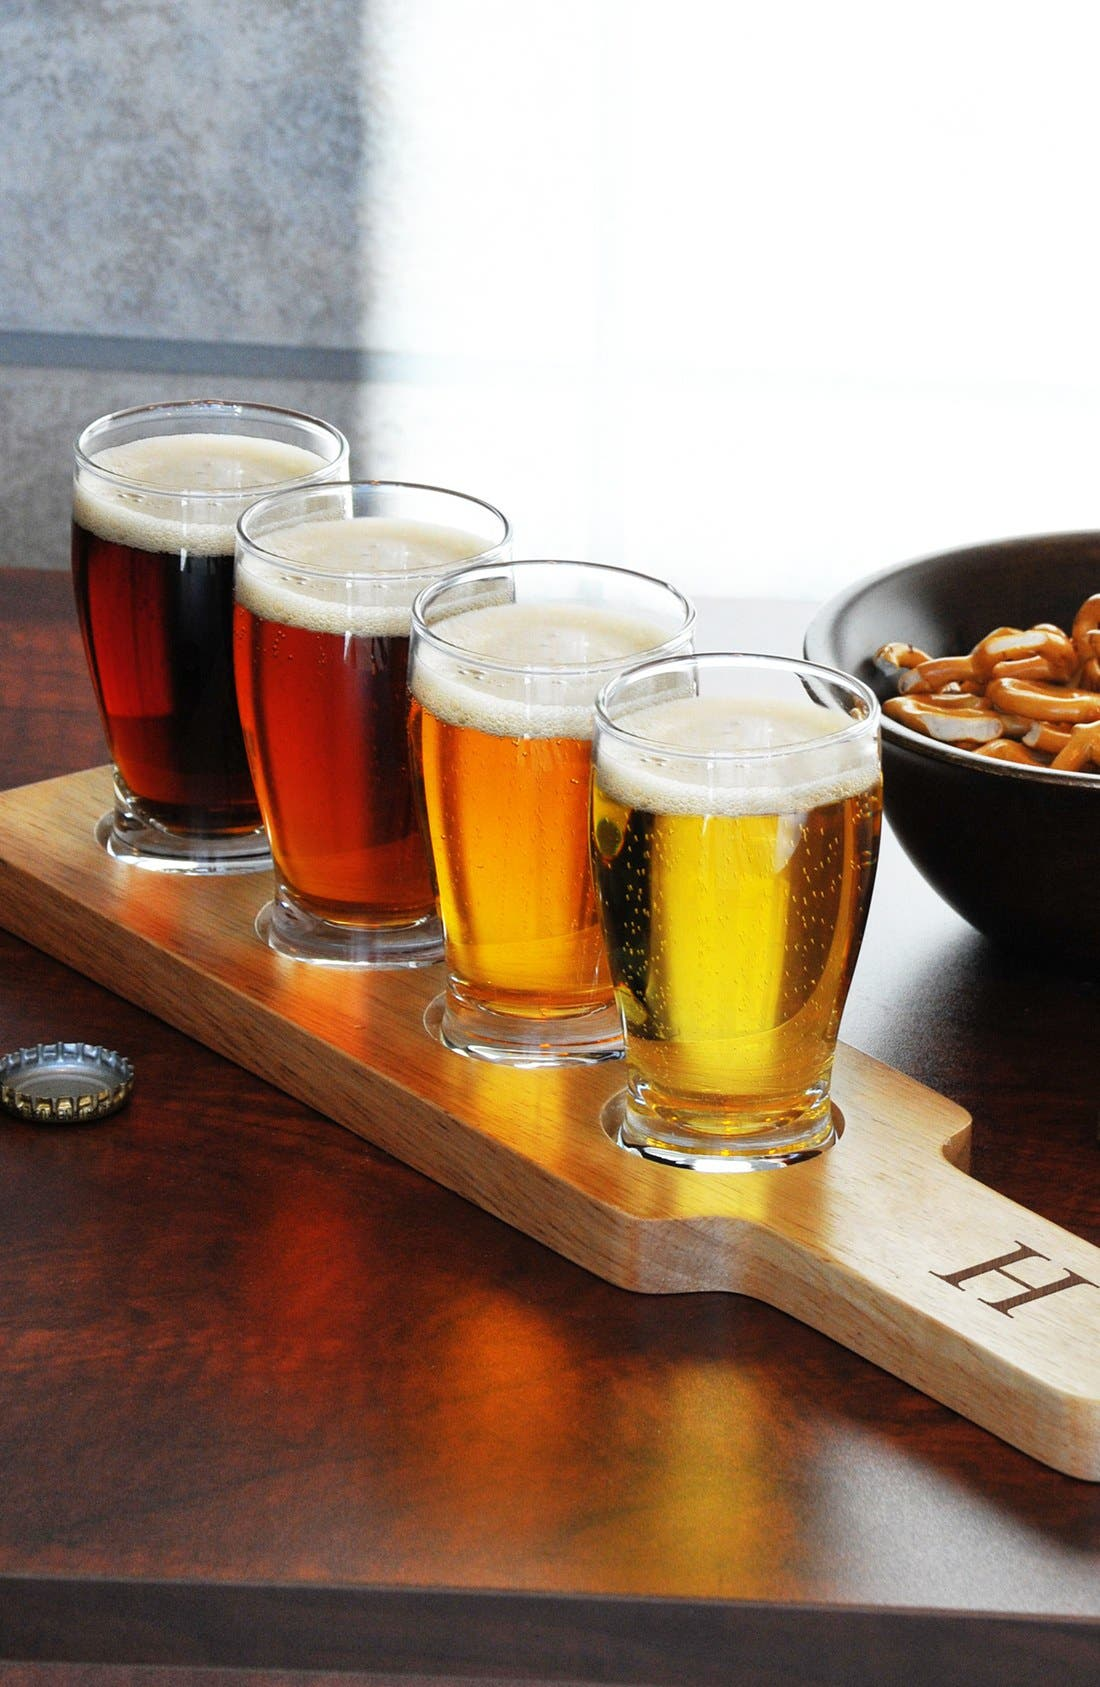 Main Image - Cathy's Concepts Monogram Beer Flight Sampler Set